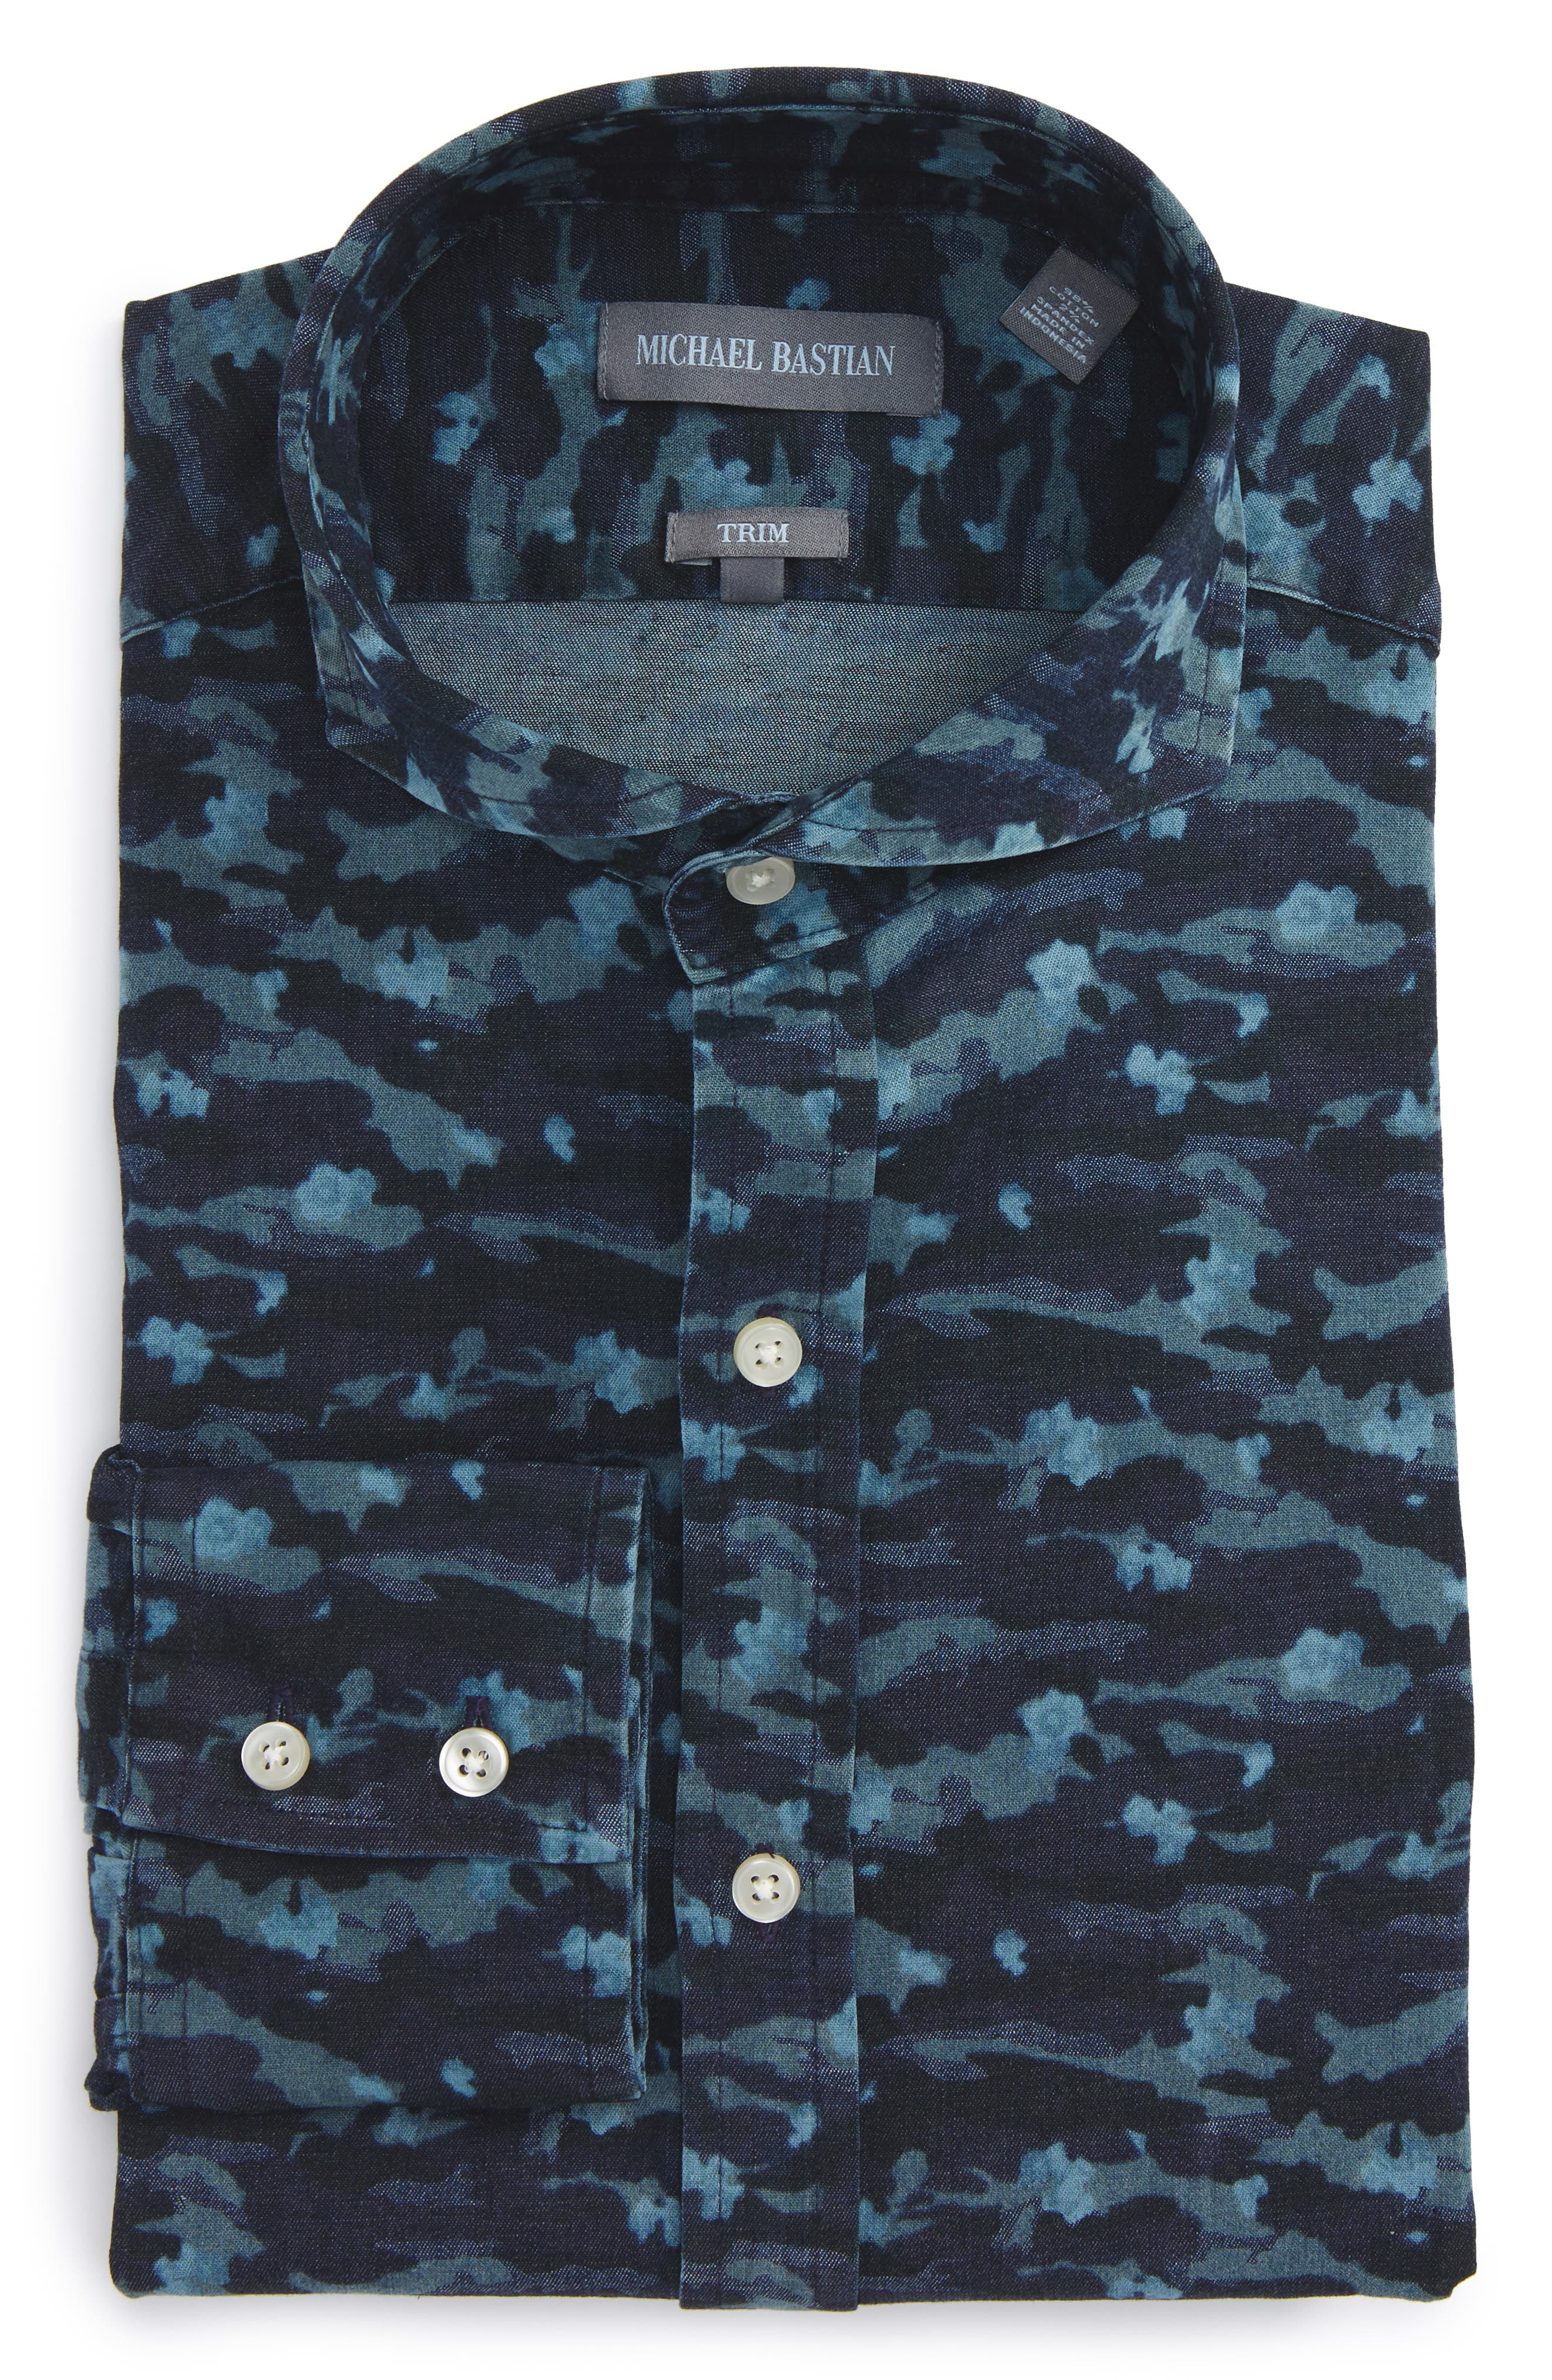 Michael Bastian Trim Fit Camo Print Dress Shirt